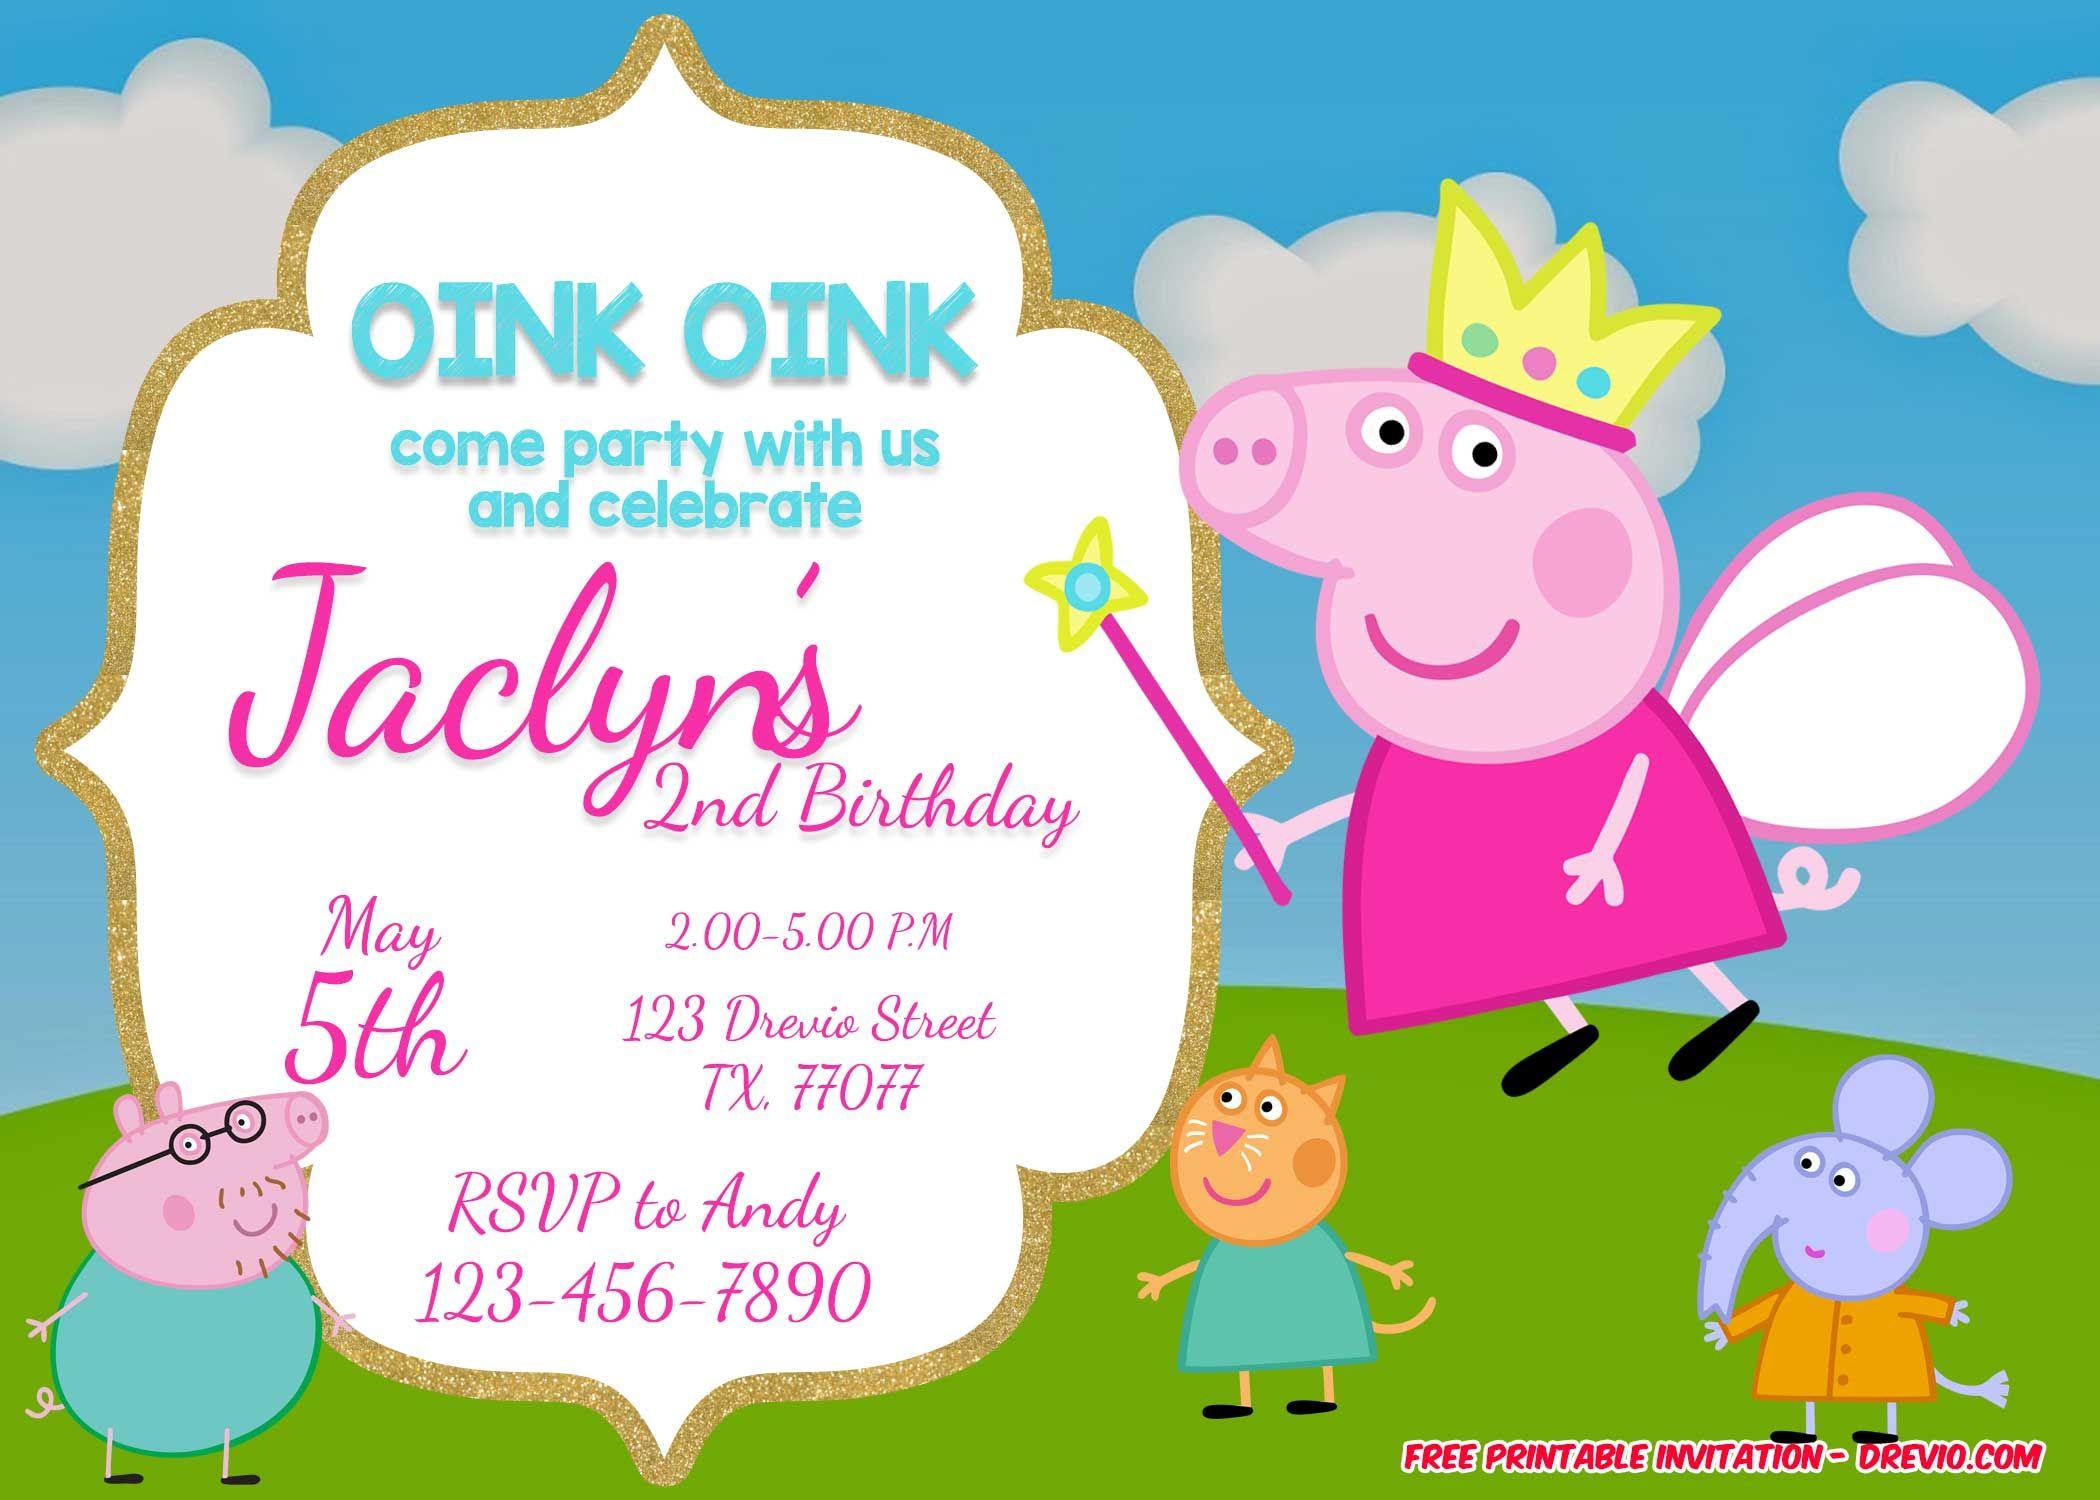 Free Printable Peppa Pig Invitation | Free Printable Birthday - Peppa Pig Character Free Printable Images